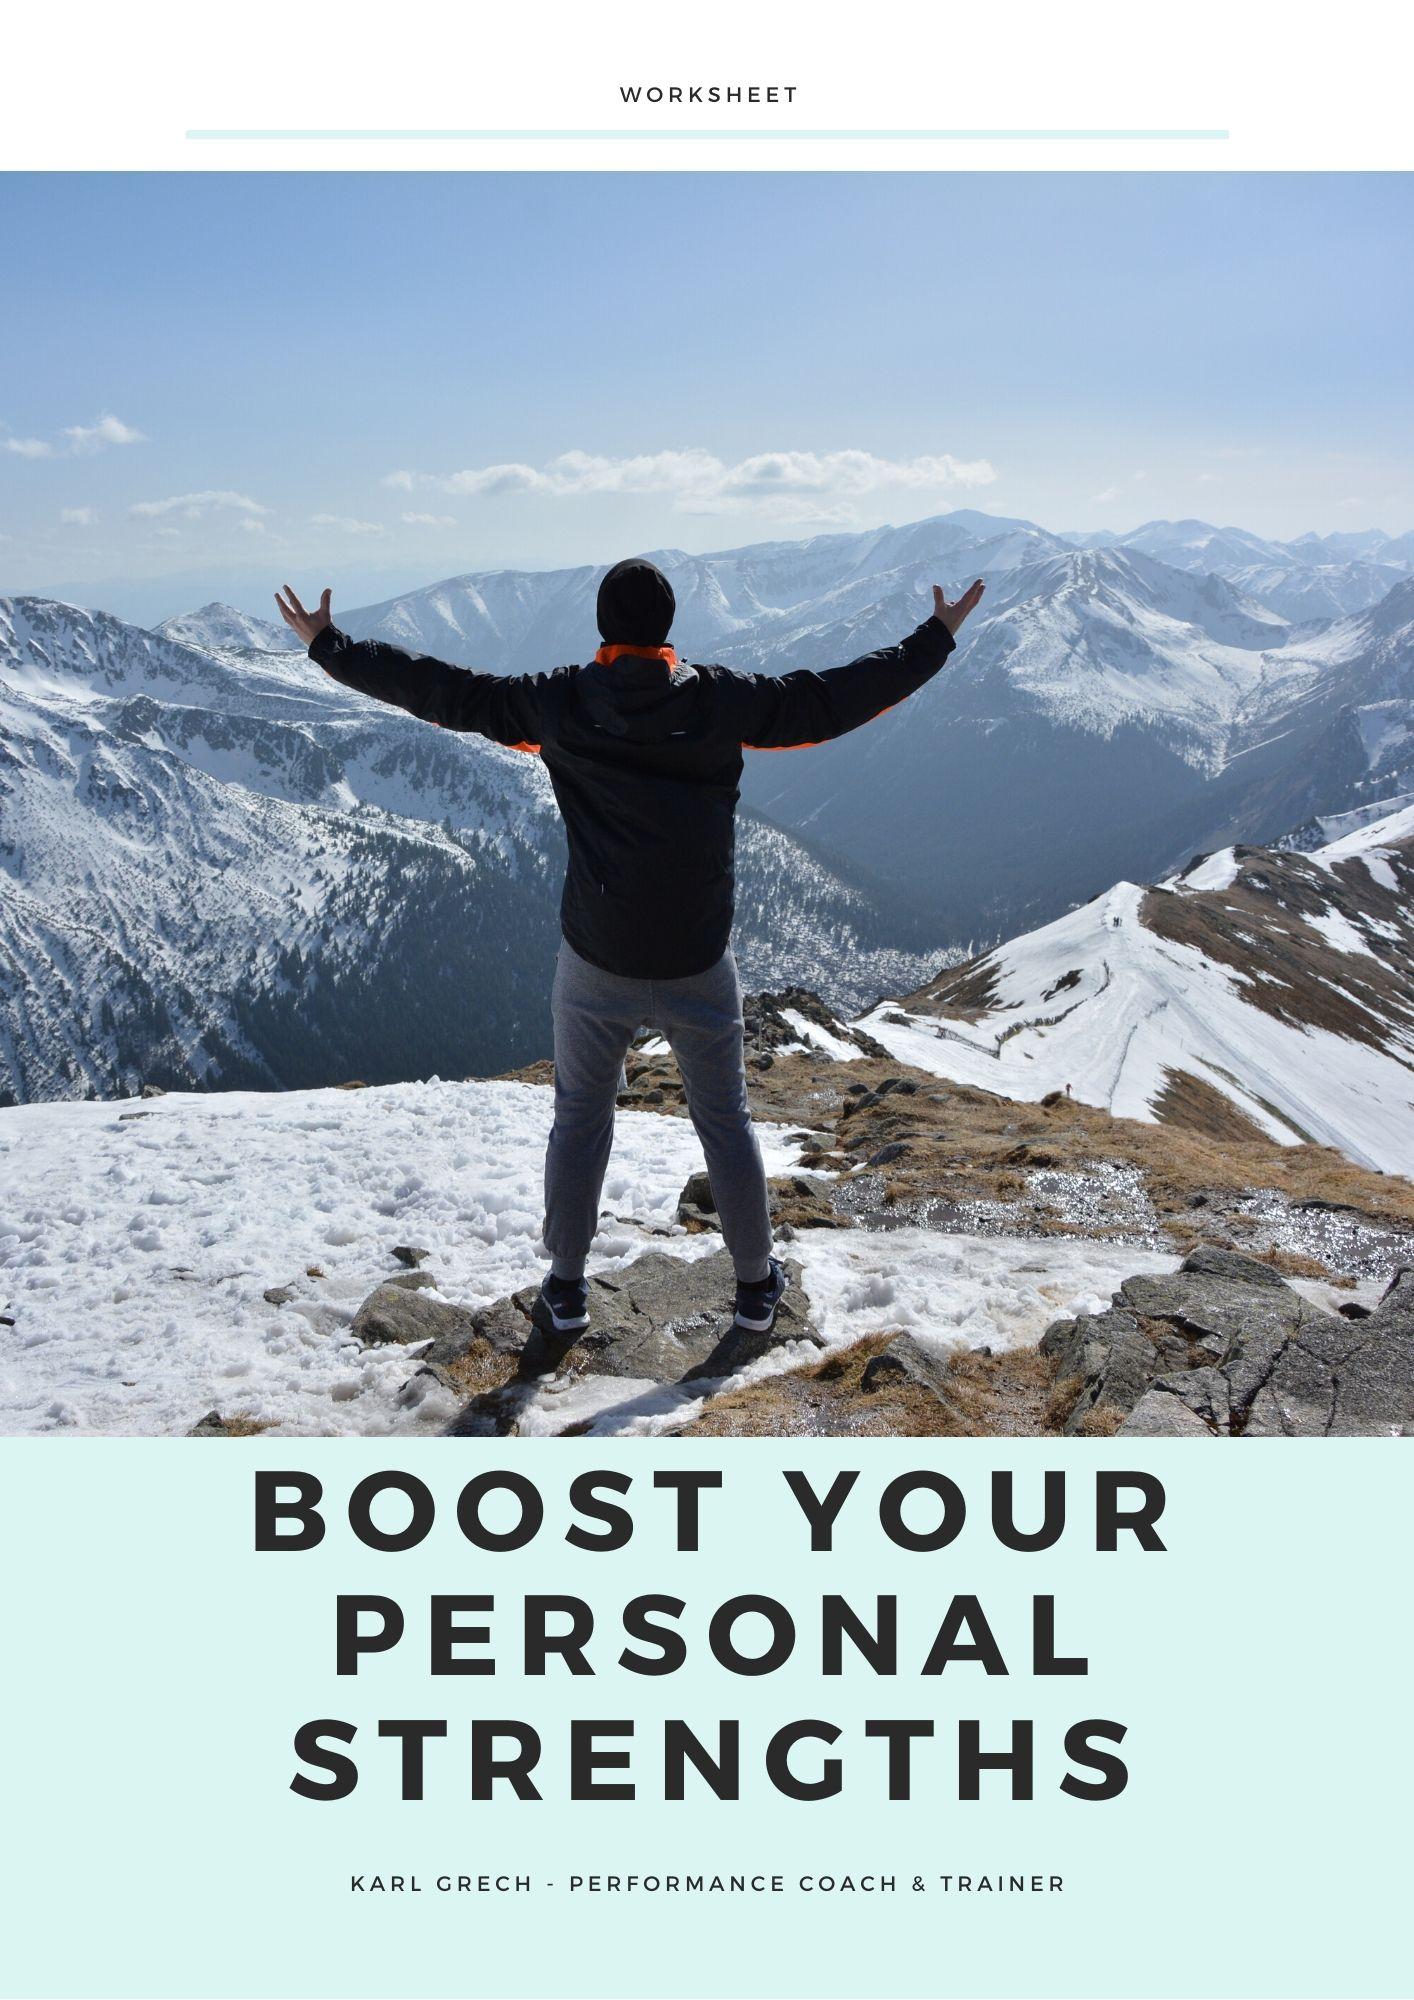 Boost Your Personal Strengths Freebie Worksheet